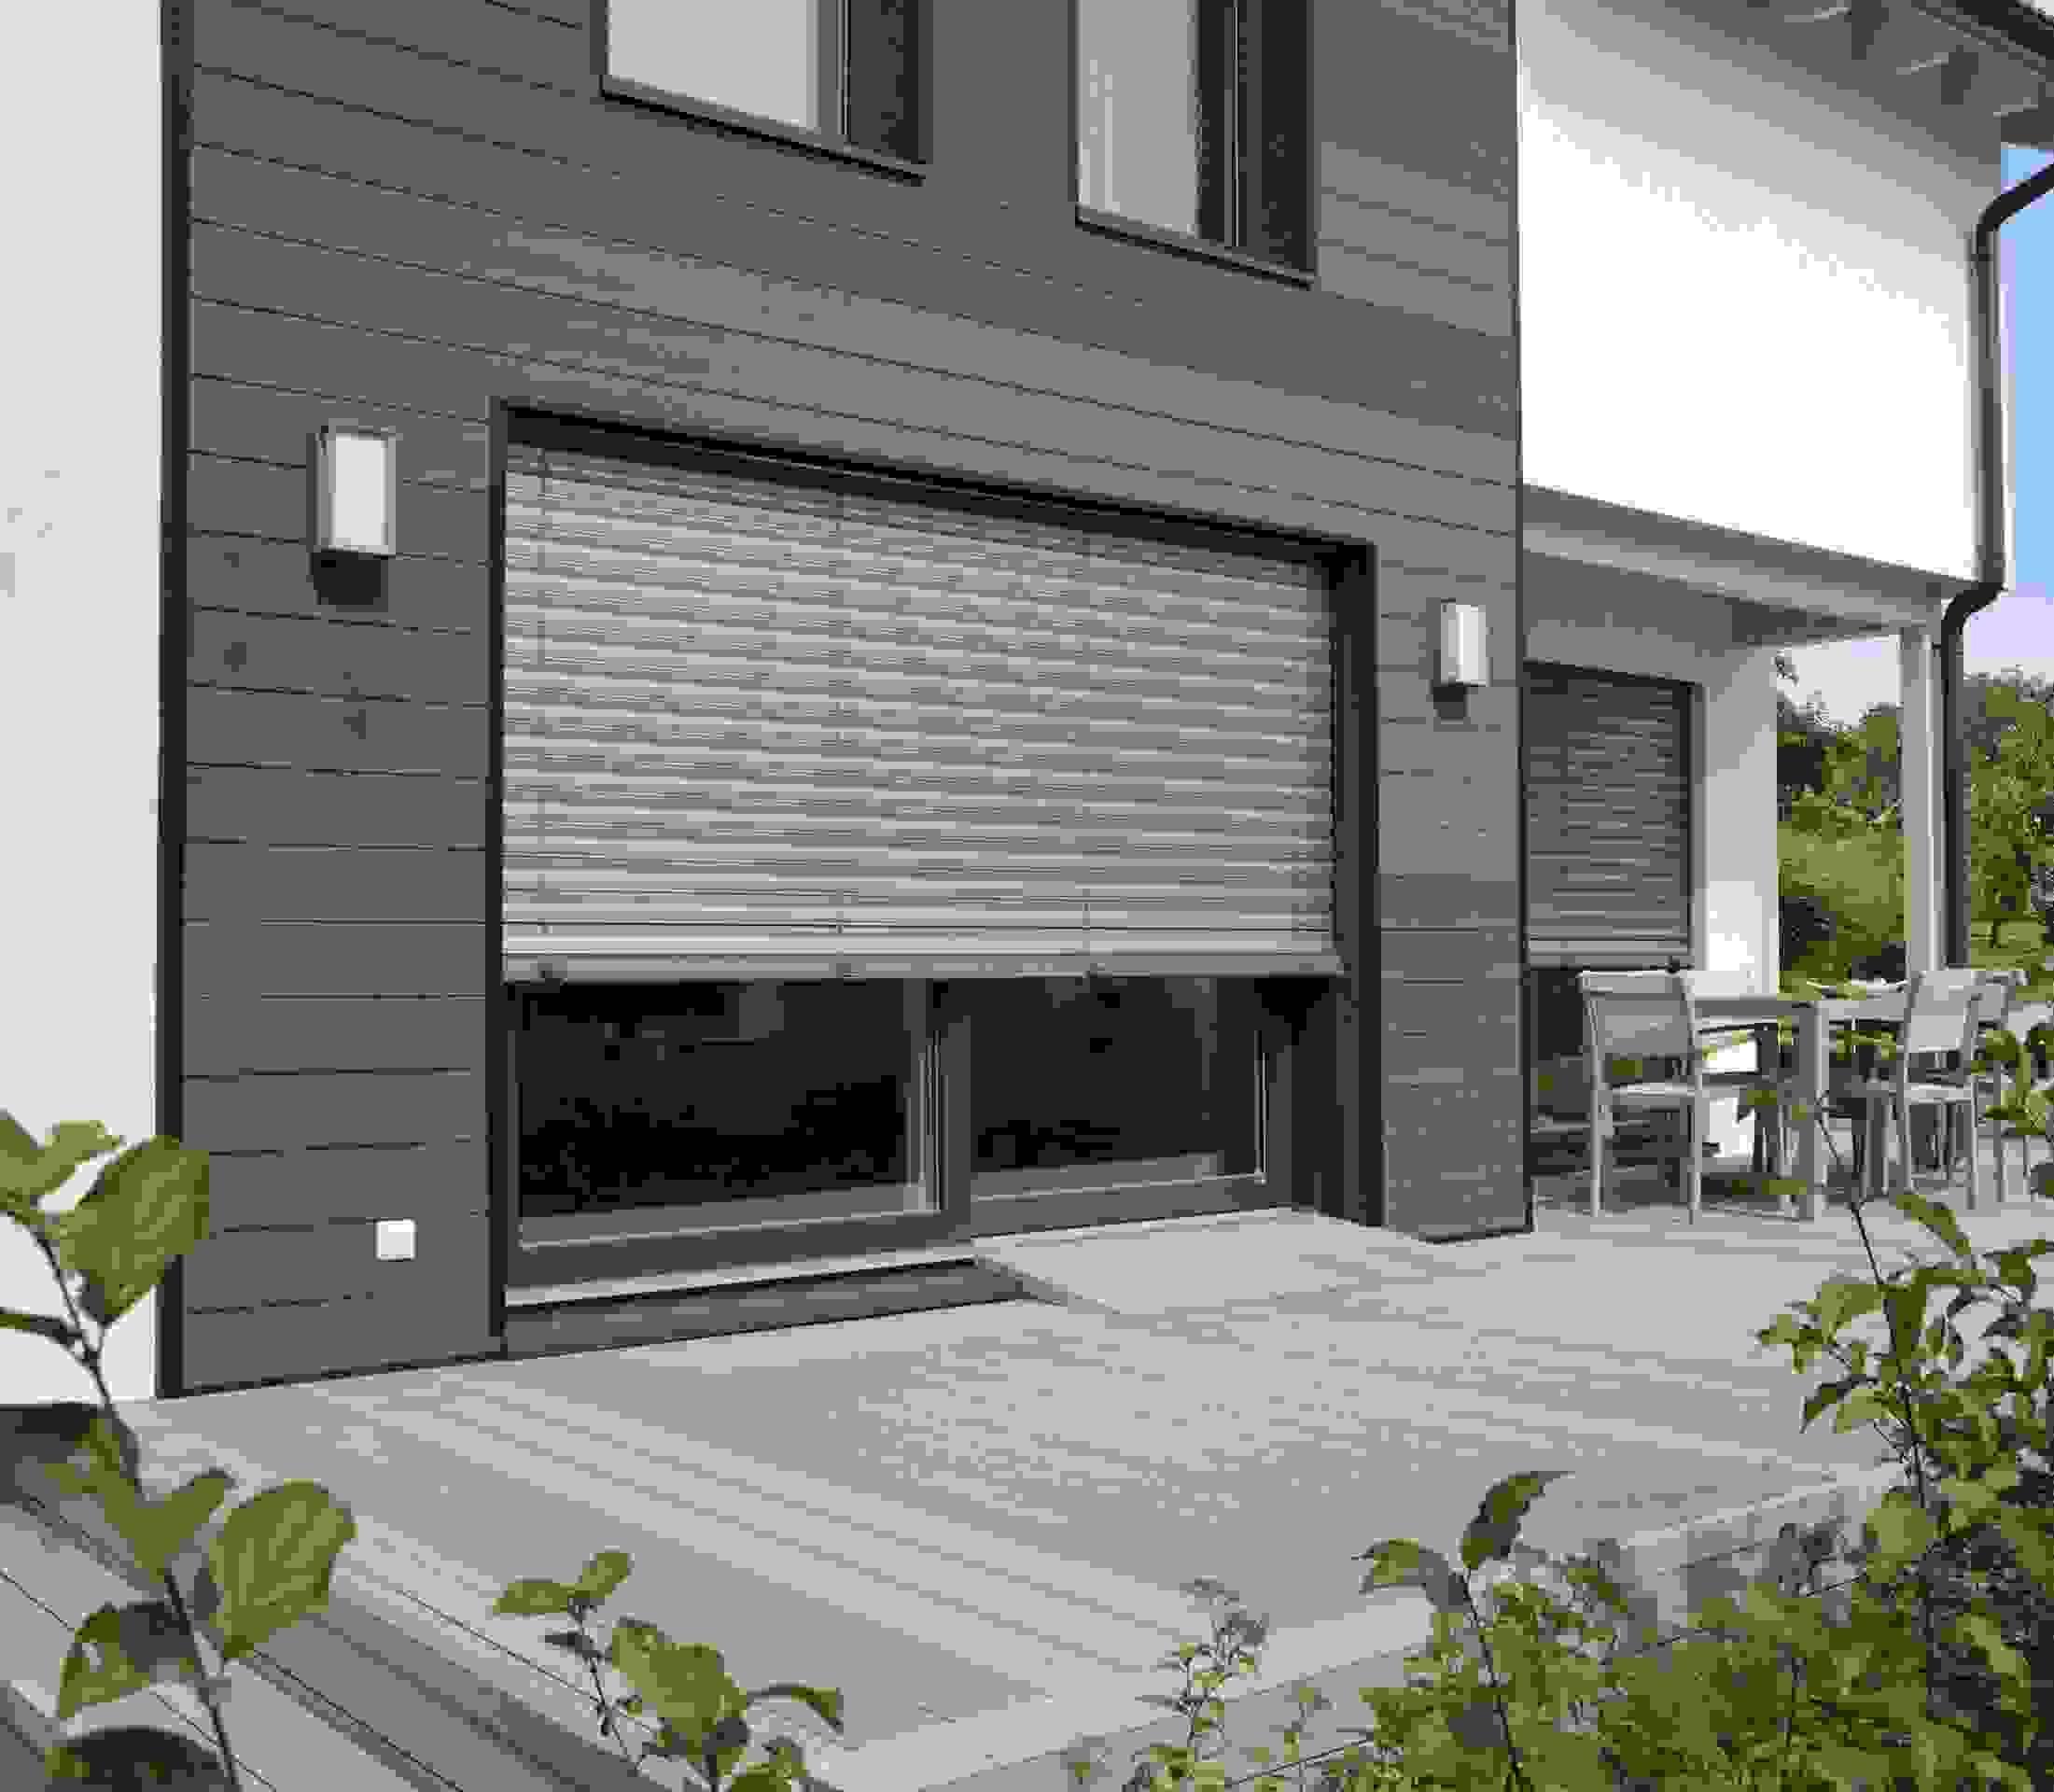 raffstore e biasi markisen wintergarten. Black Bedroom Furniture Sets. Home Design Ideas